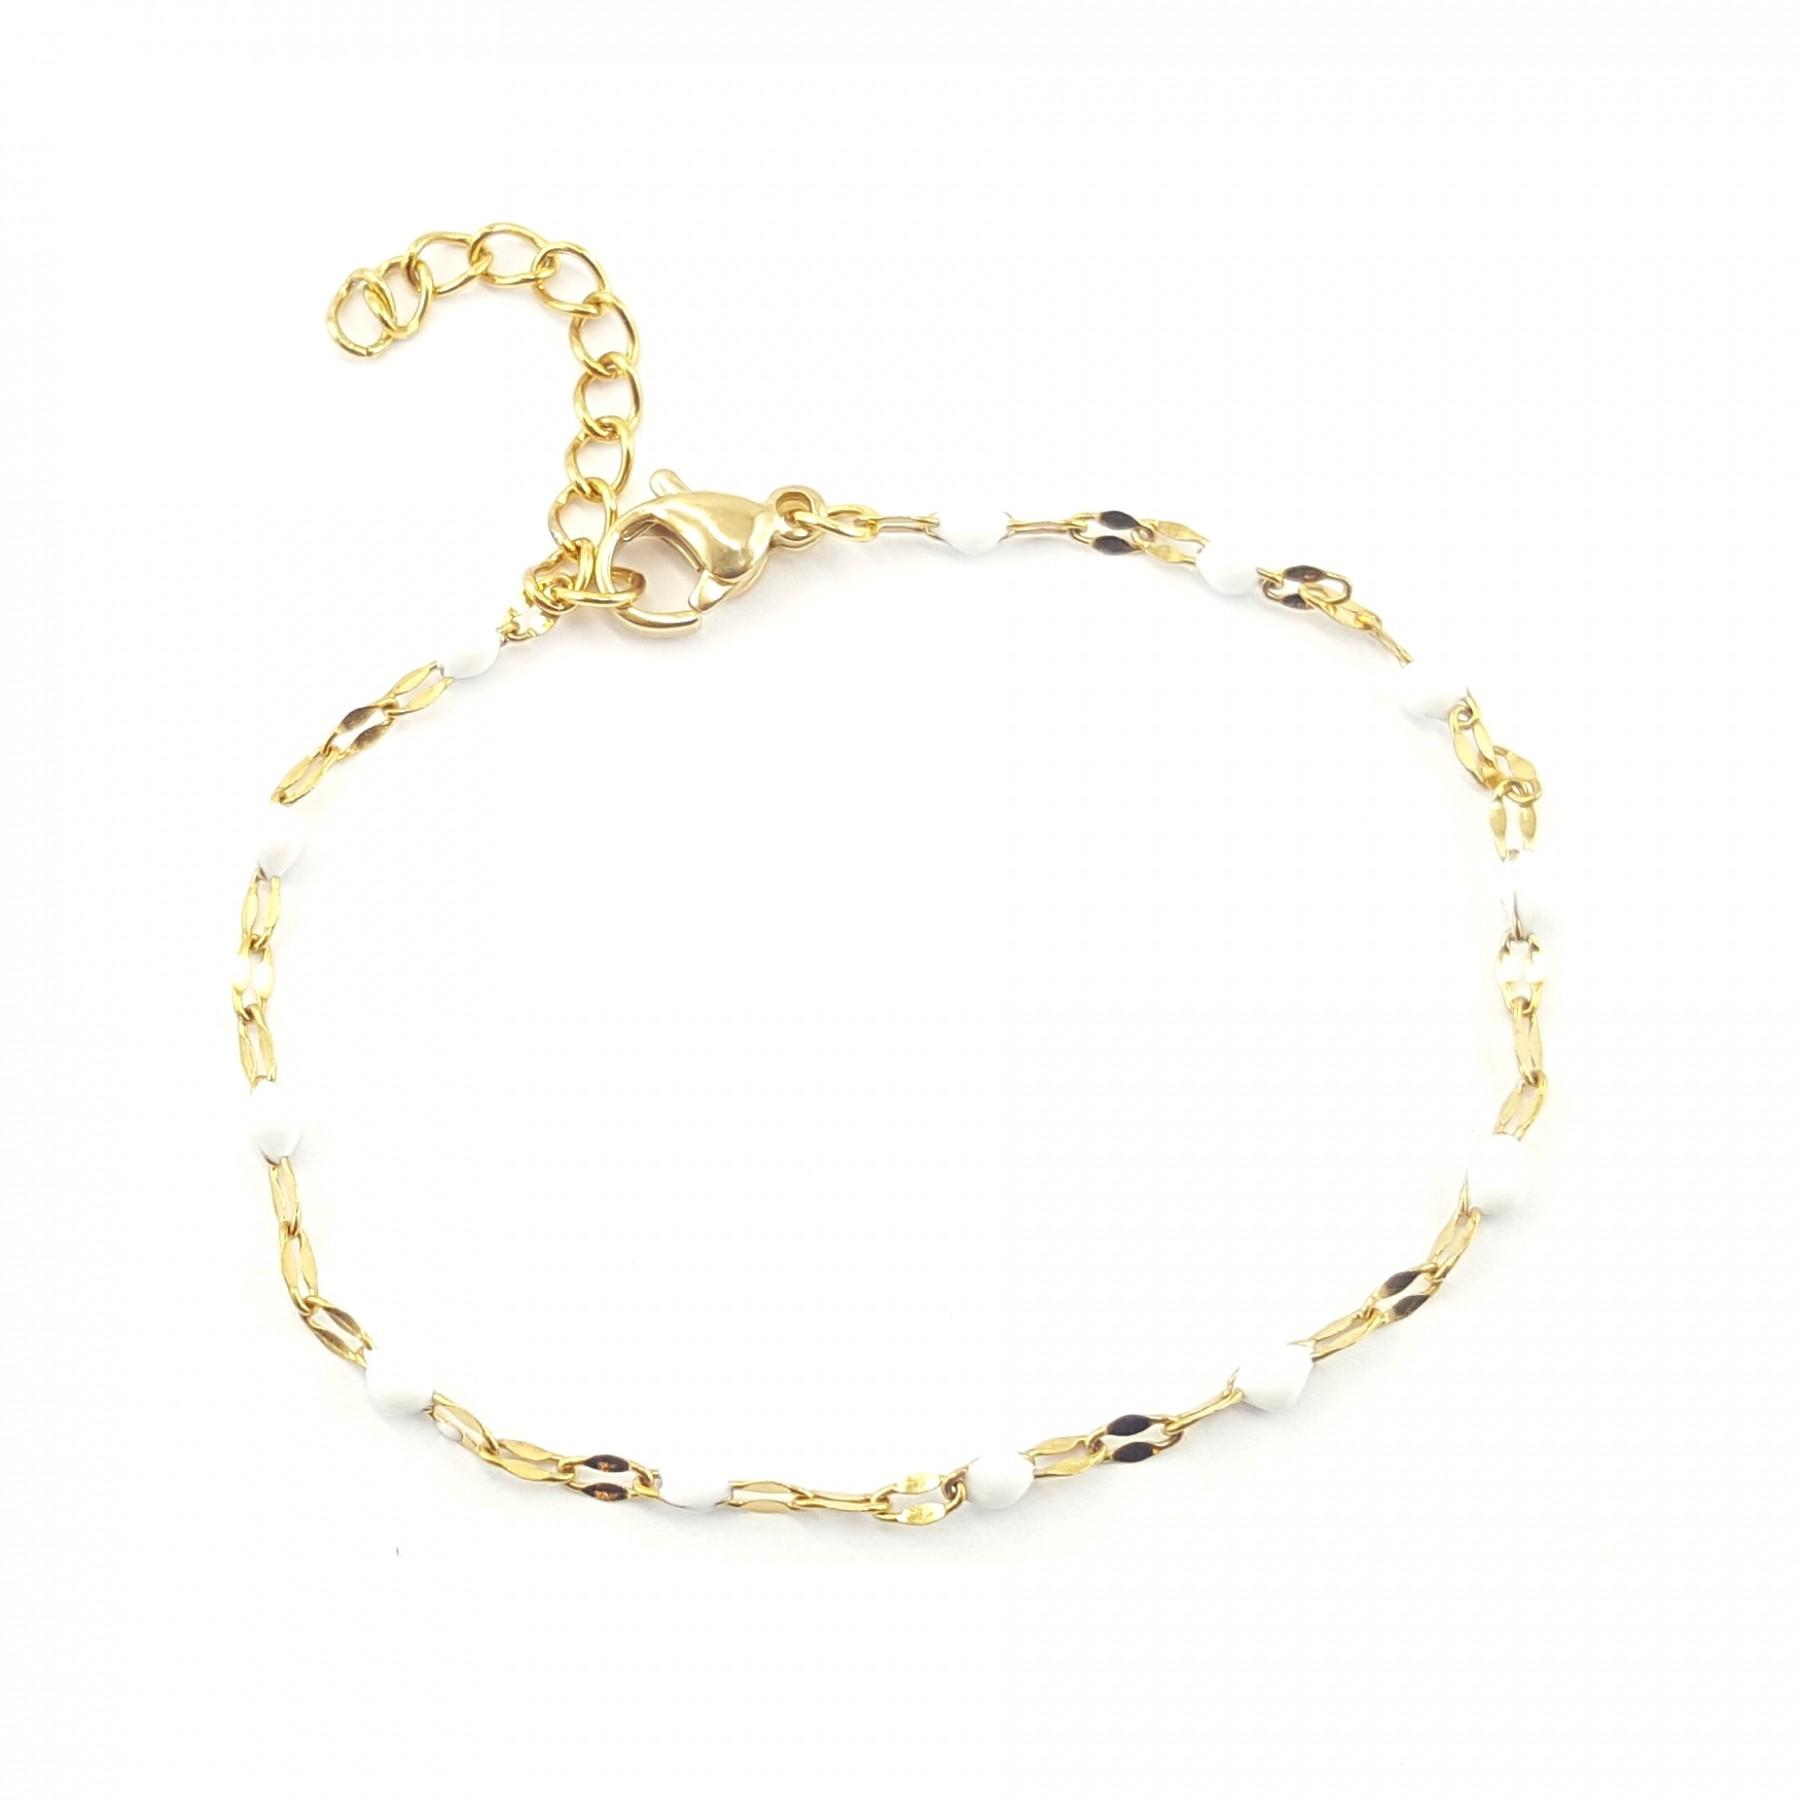 Bracelet chaîne émaillée